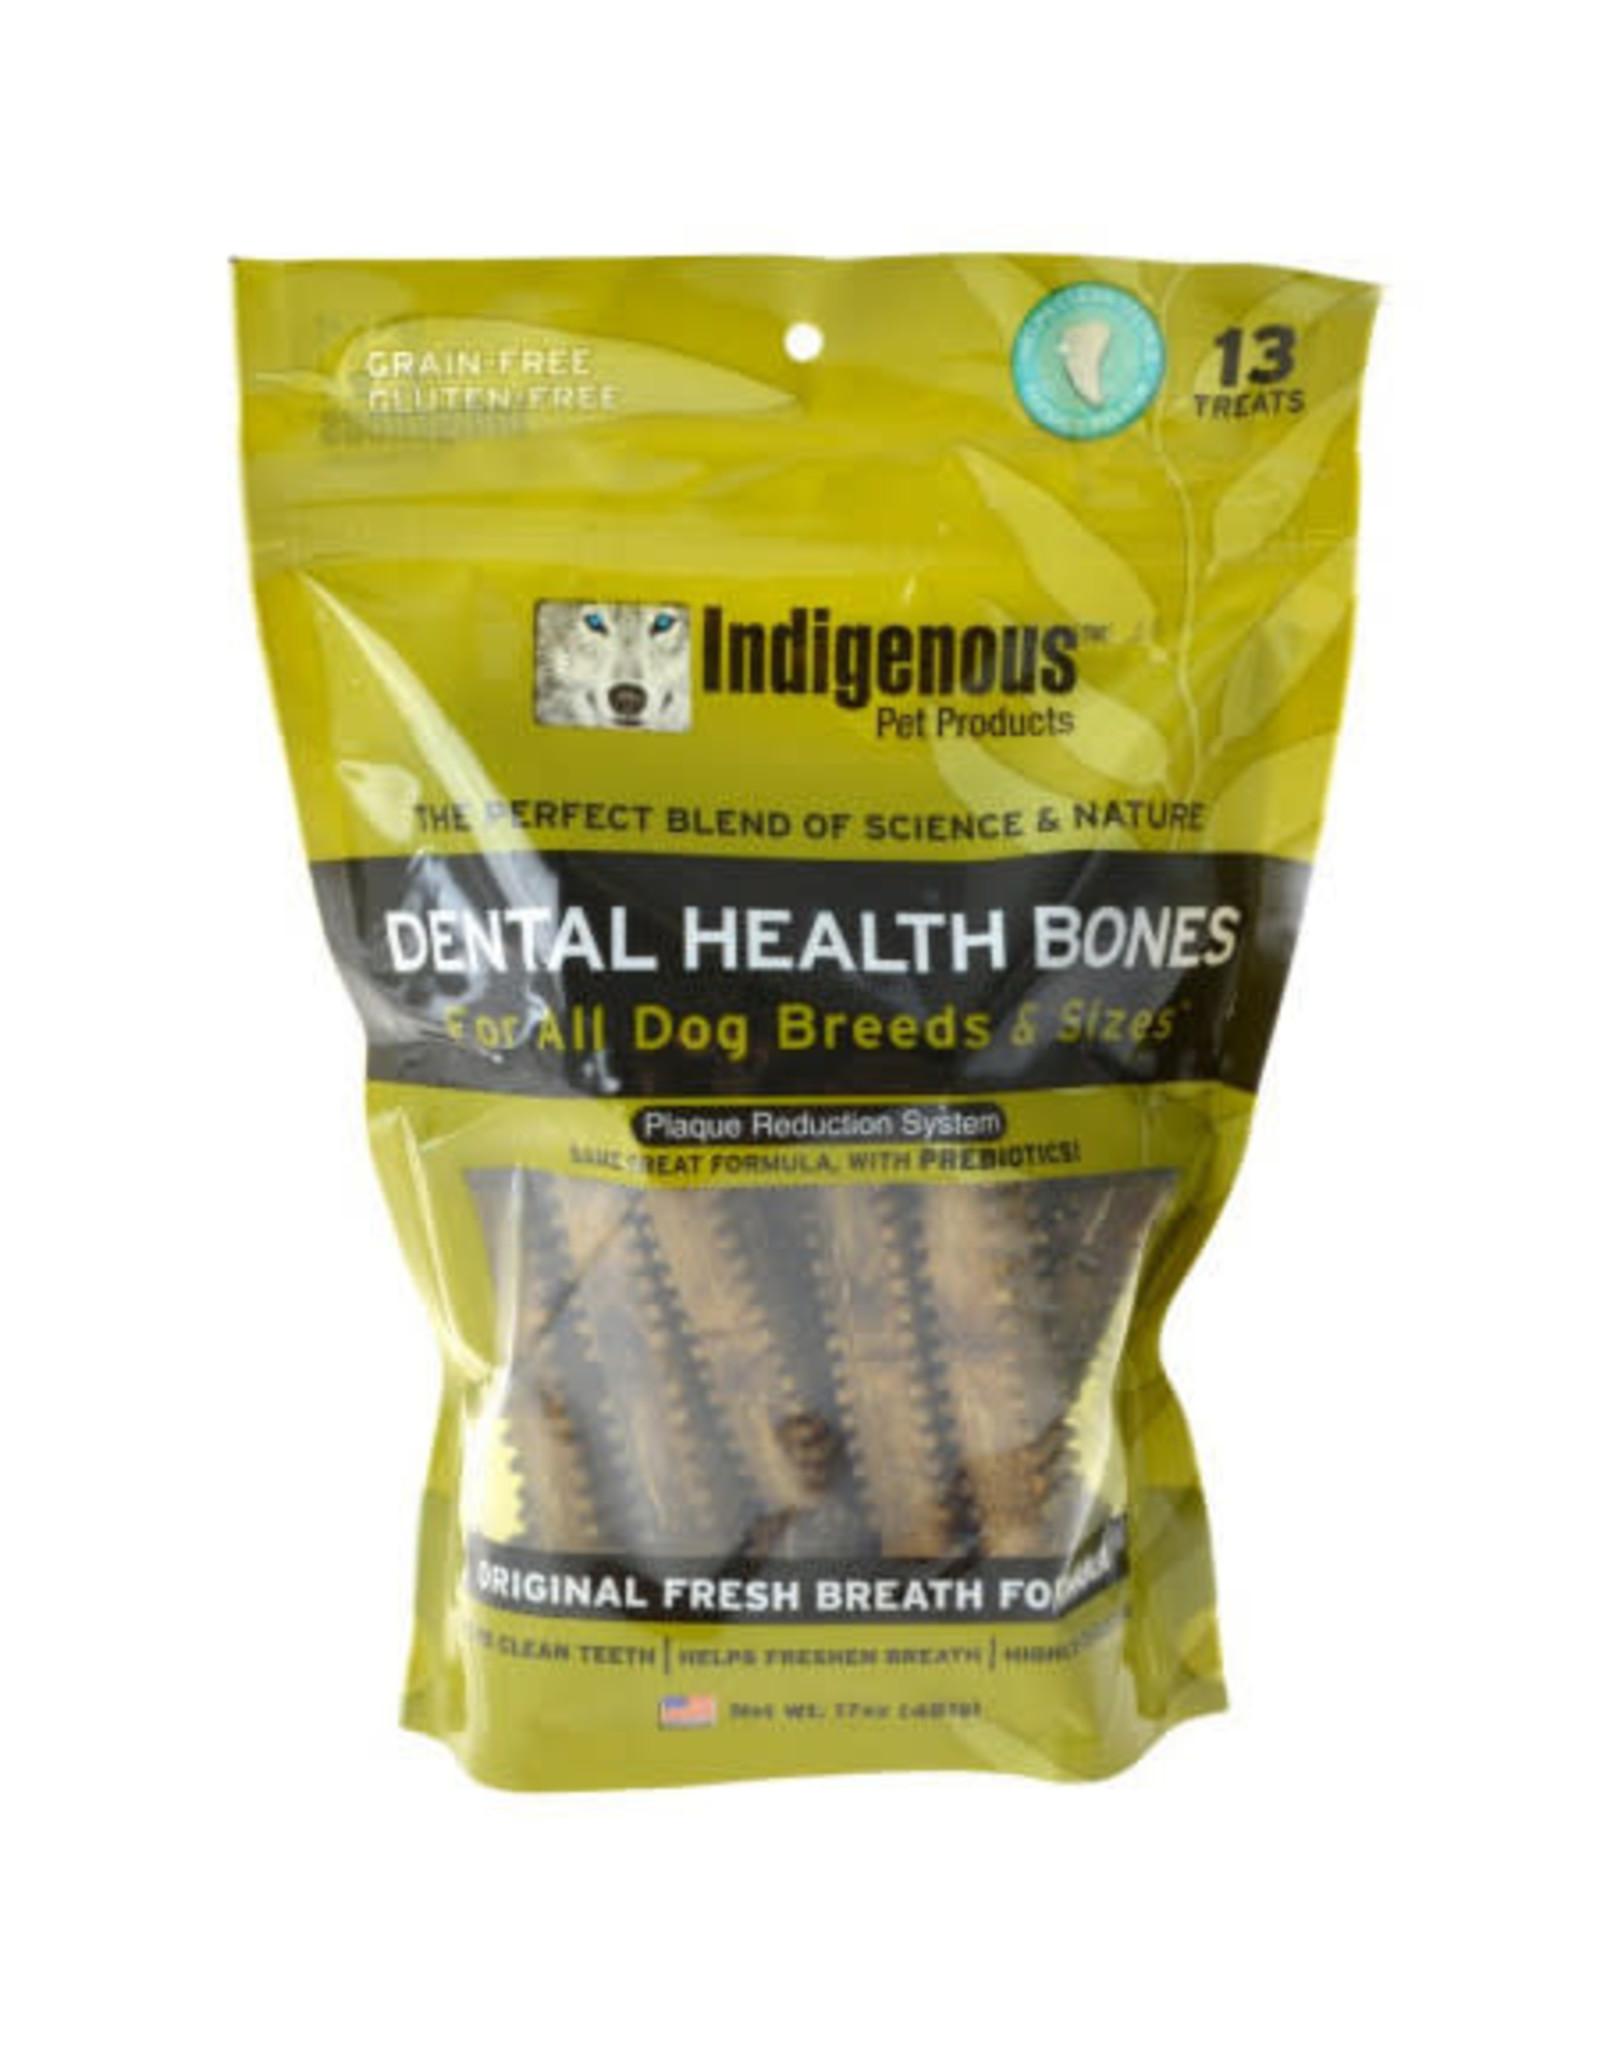 Indigenous Pet Products INDIGENOUS DENTAL HEALTH BONES ORIGINAL FRESH BREATH FLAVOR 13-COUNT